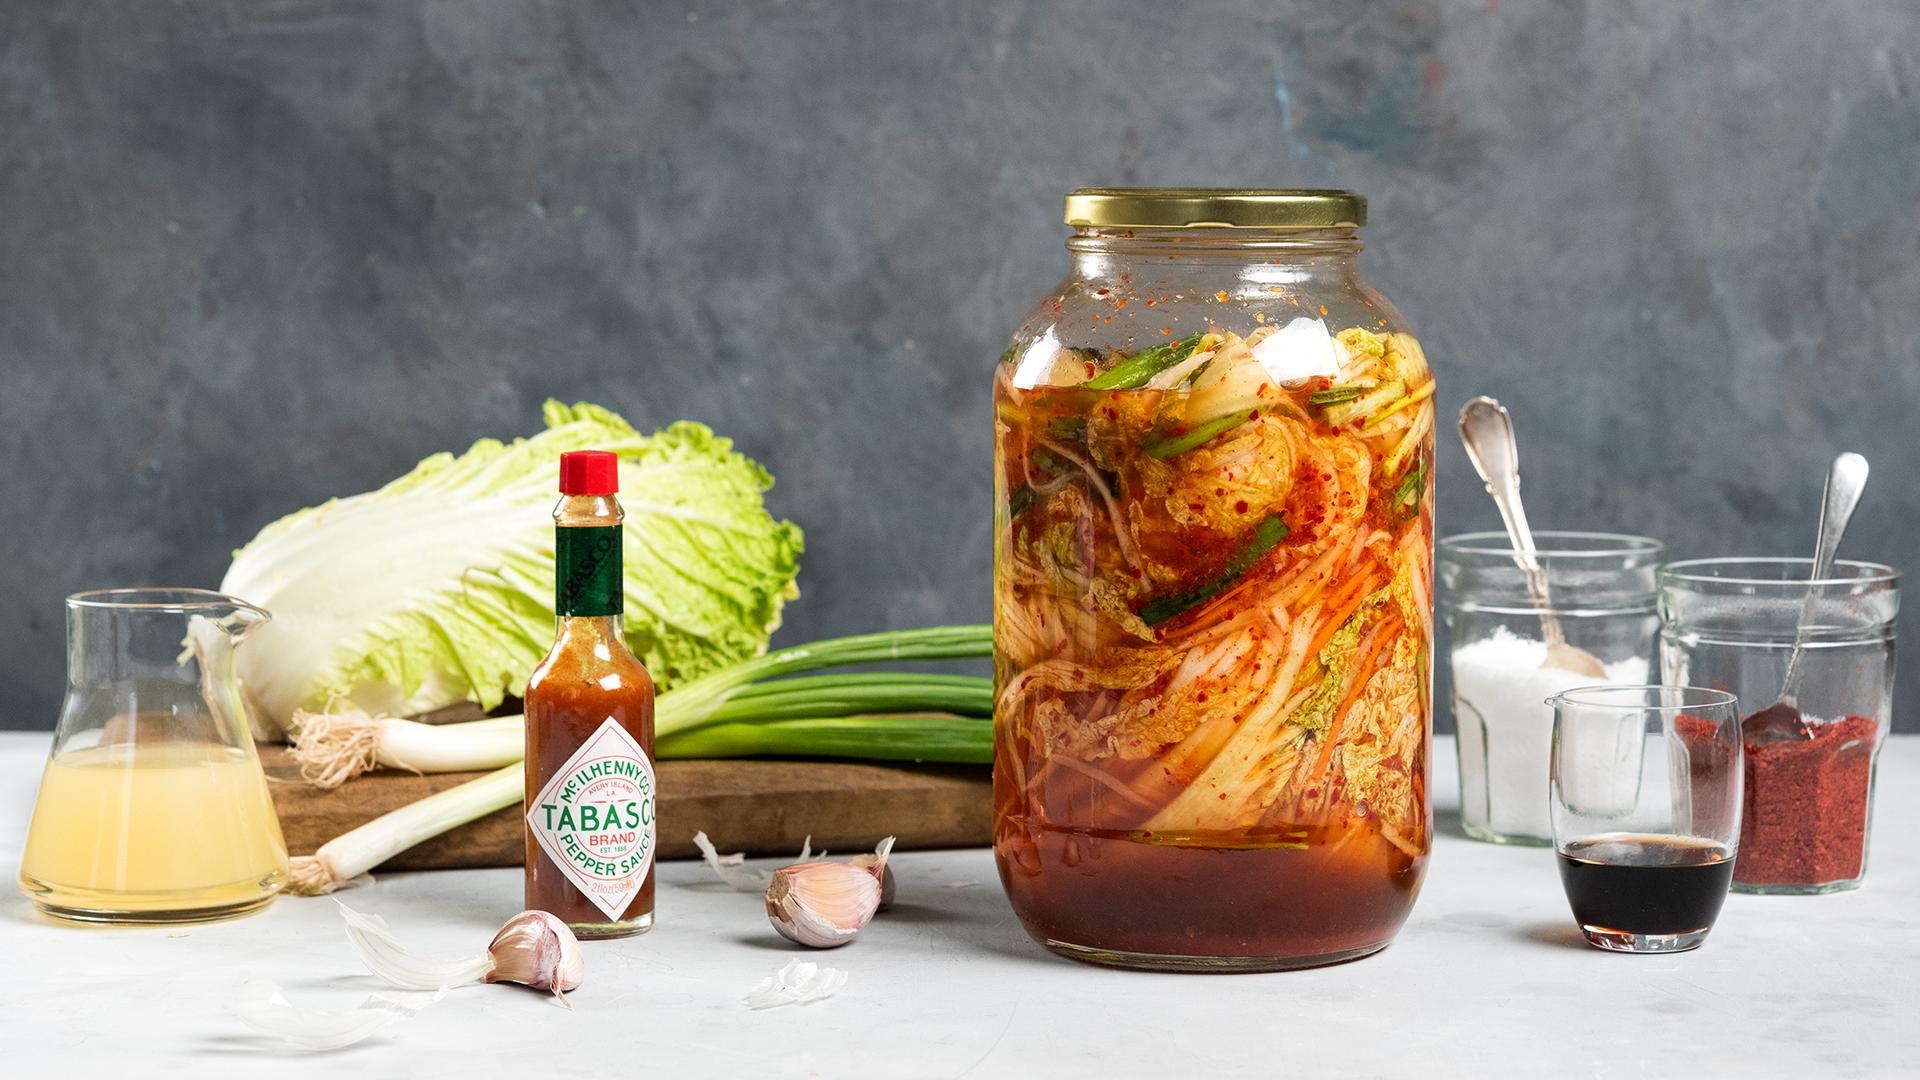 Kimchi - Tabasco- Food Stylist Judy Kim - photo Evan Sung